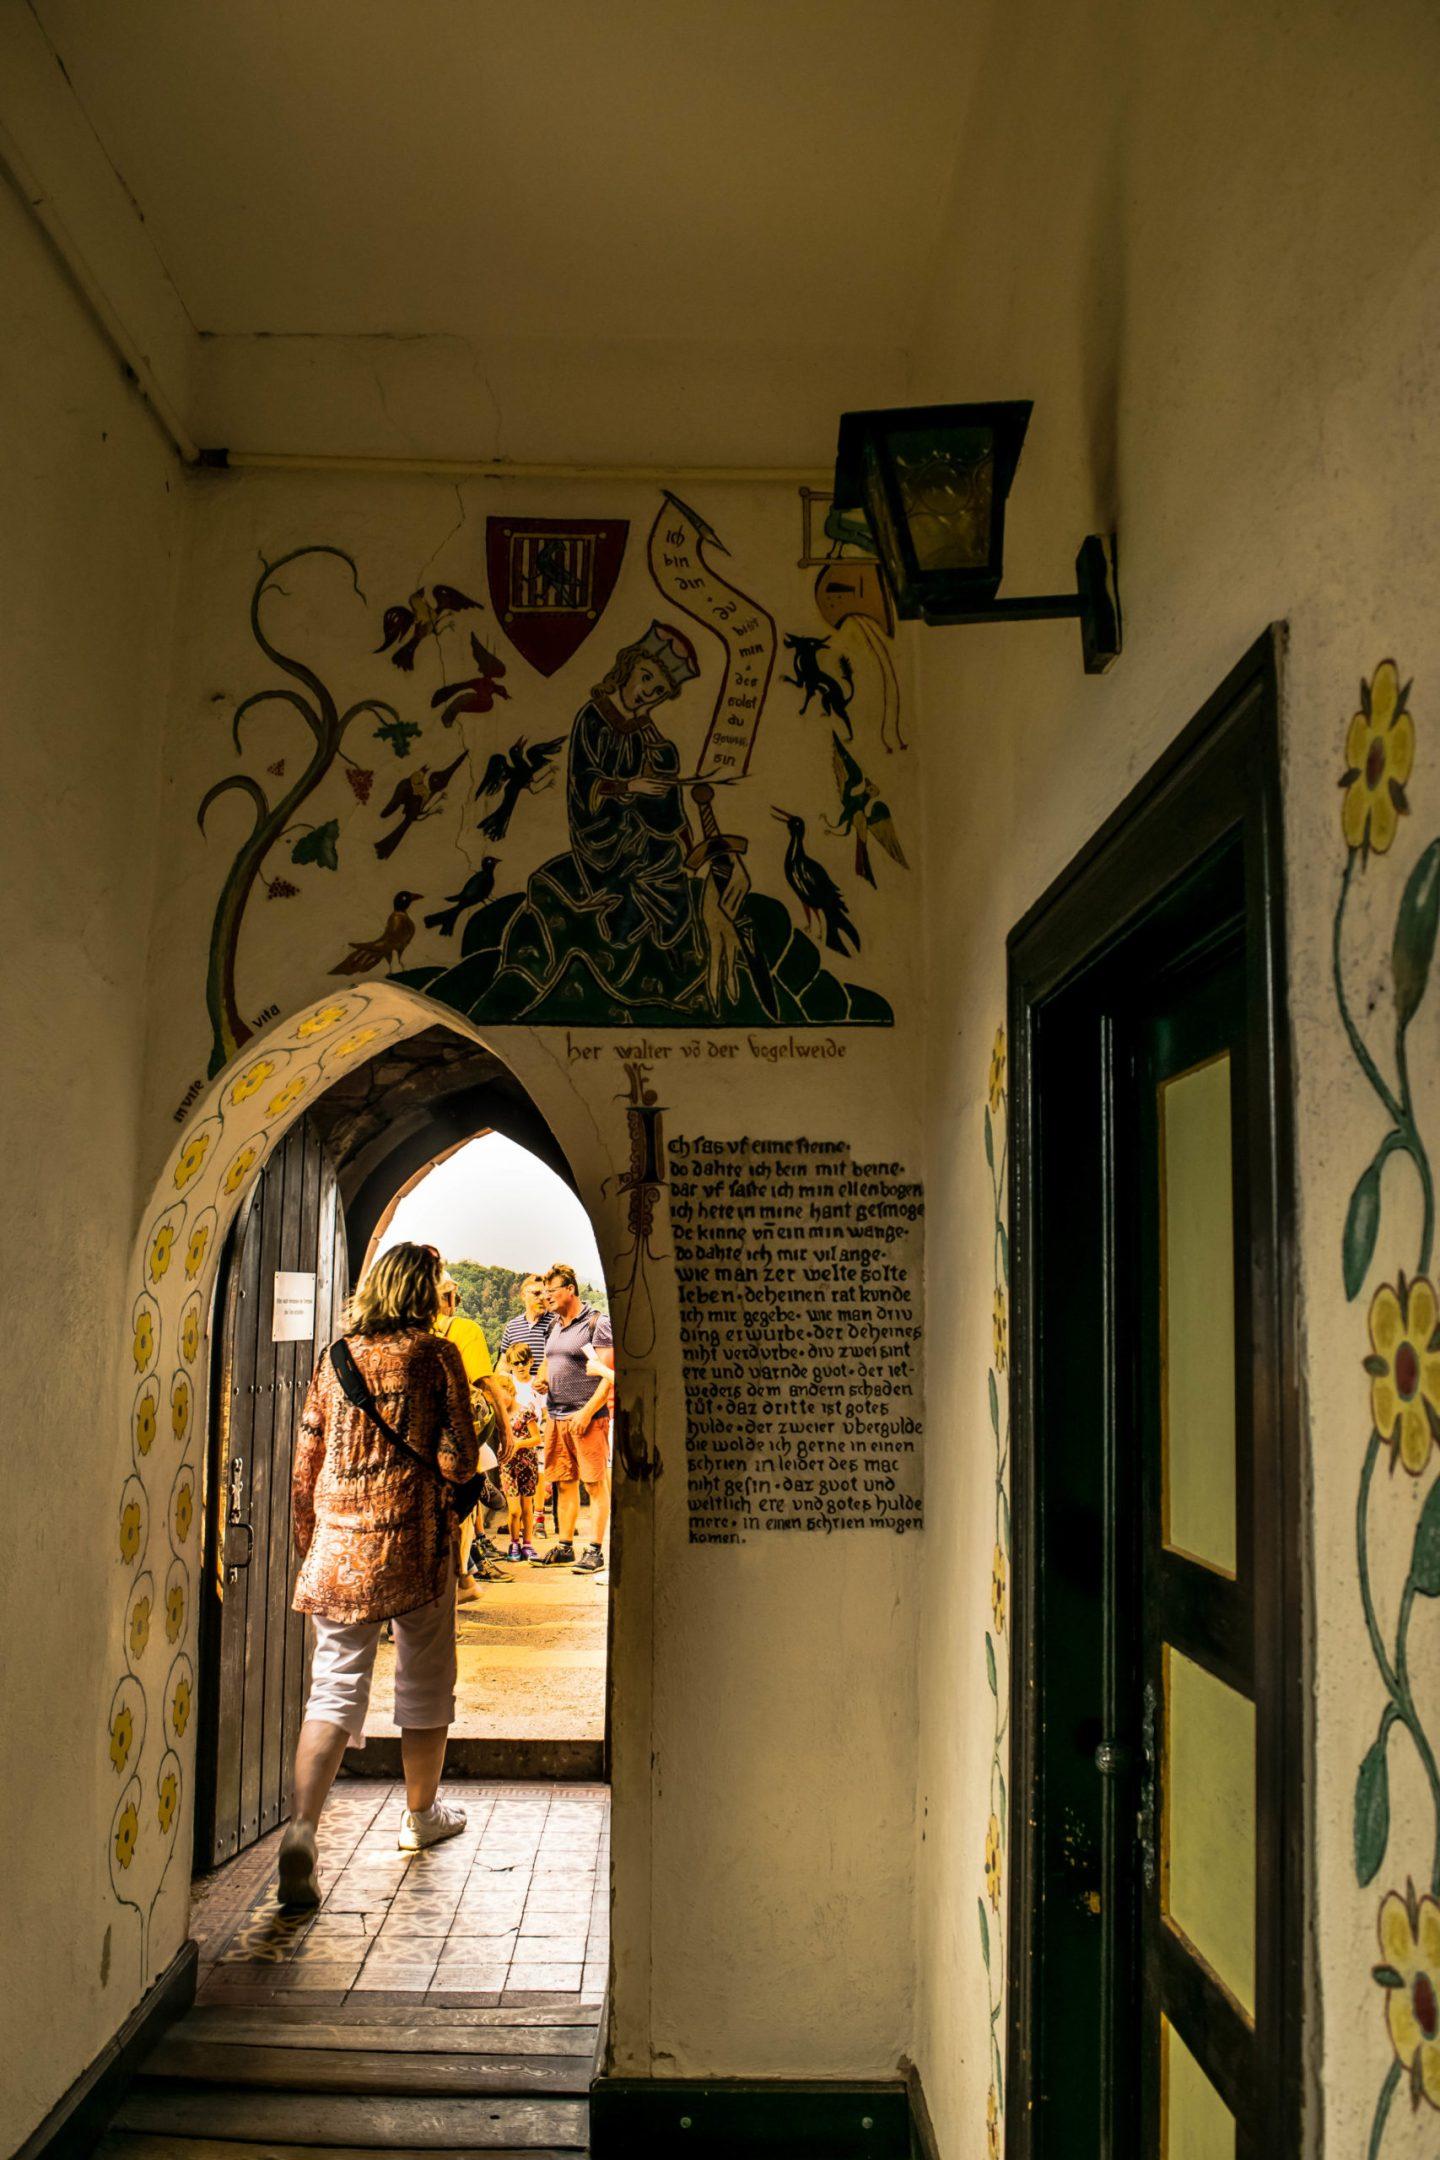 Five castles to visit in Germany that aren't Neuschwanstein